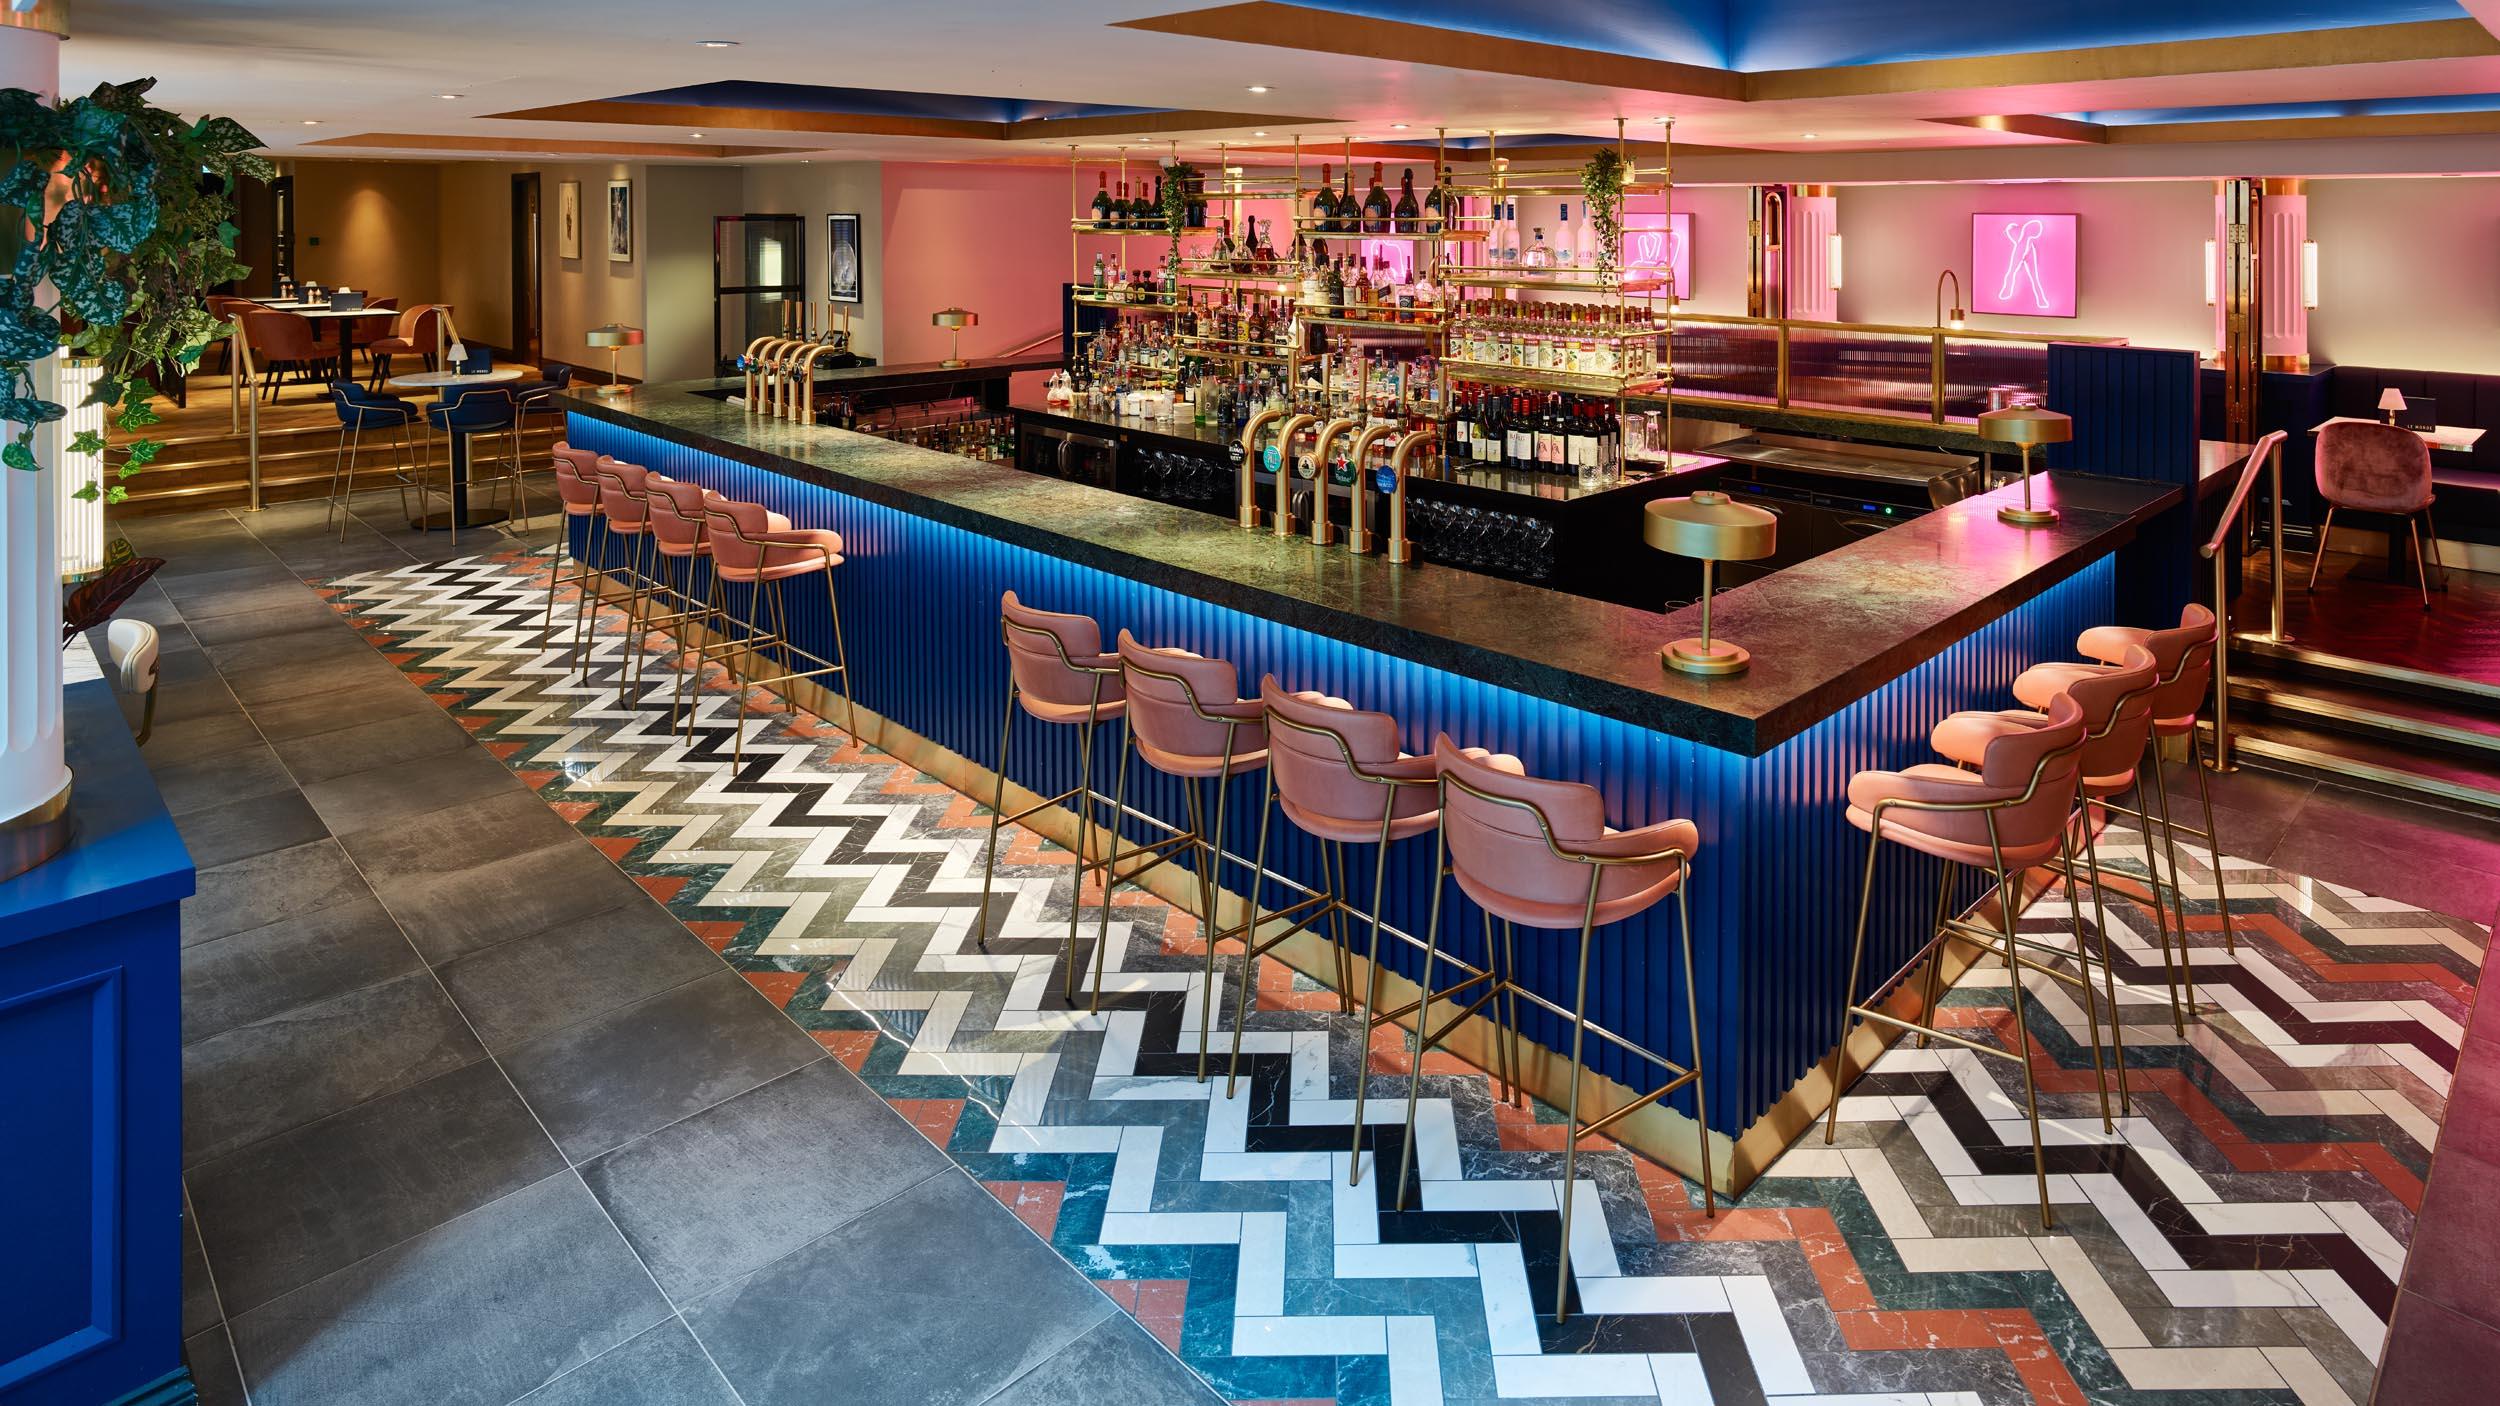 Bar - Le Monde Restaurant - RYE Design